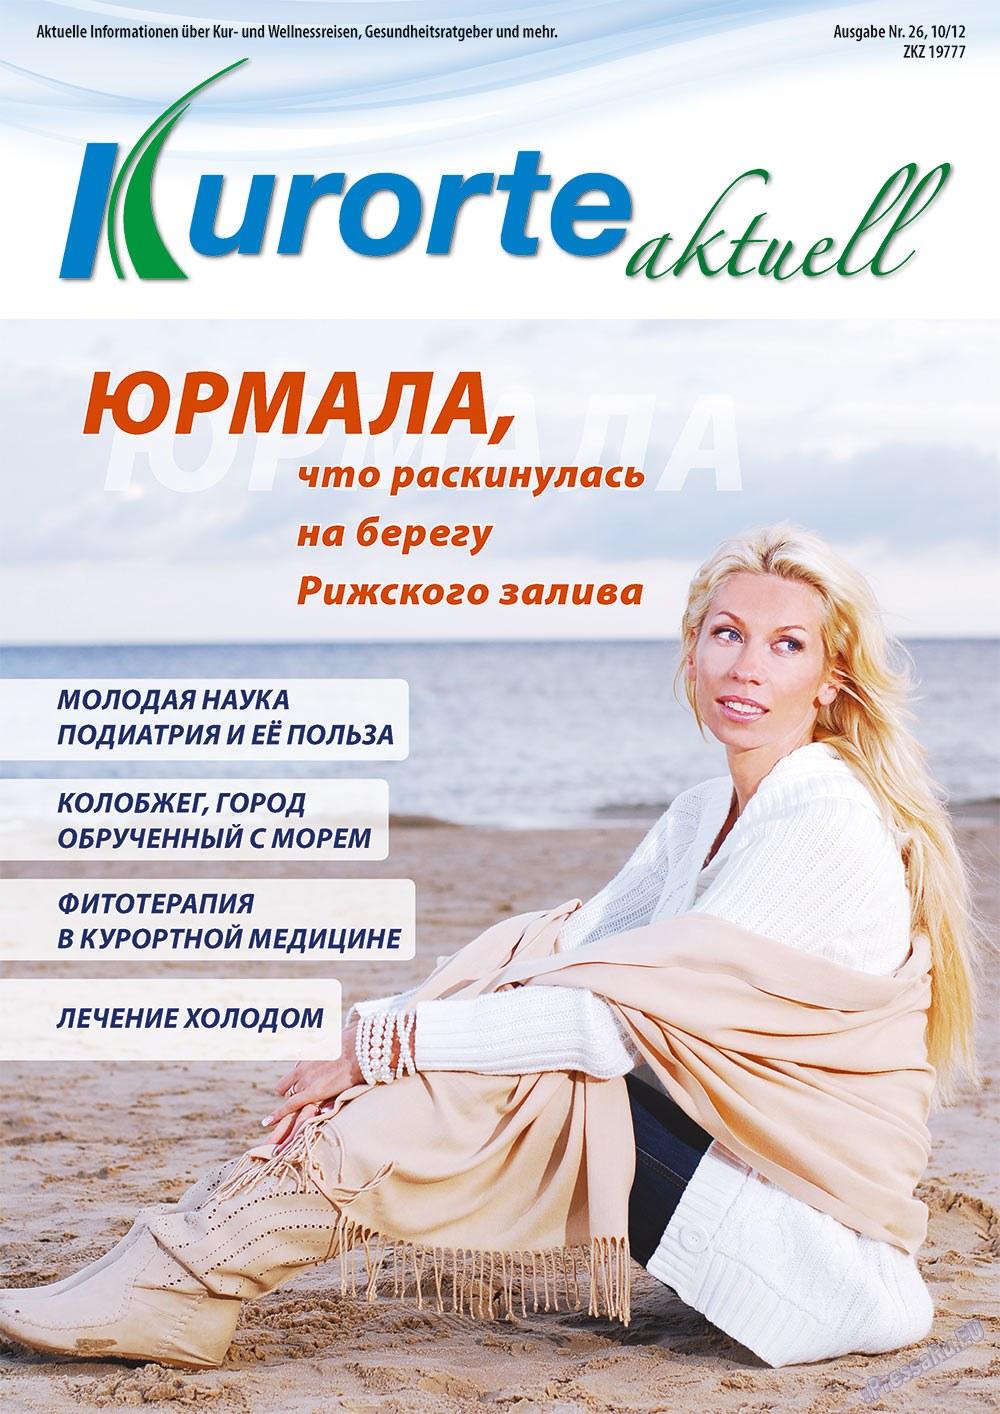 Kurorte aktuell (газета). 2012 год, номер 26, стр. 1